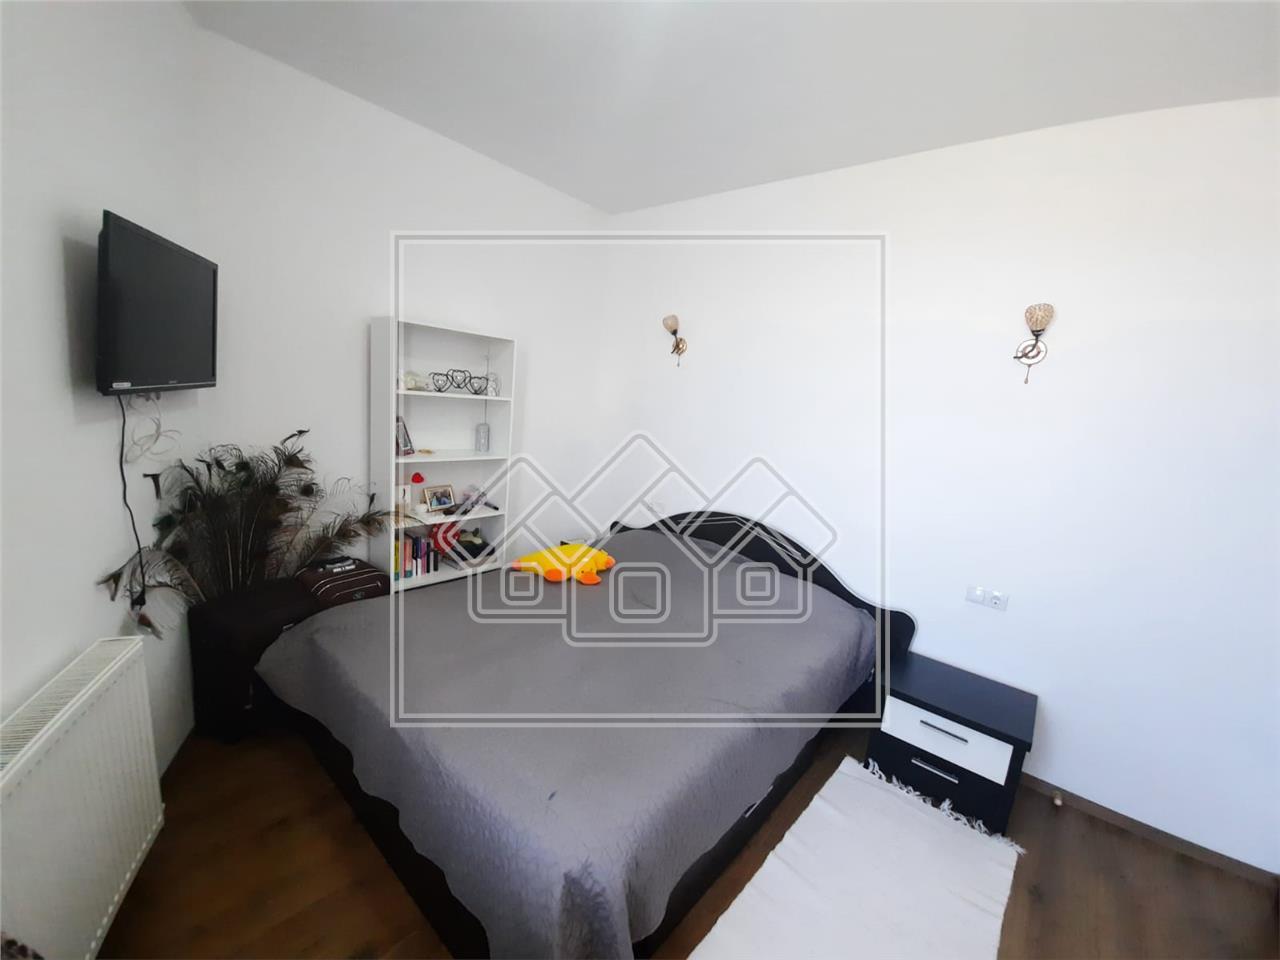 Apartament de inchiriat in Sibiu -3 camere- mobilat si utilat-Selimbar